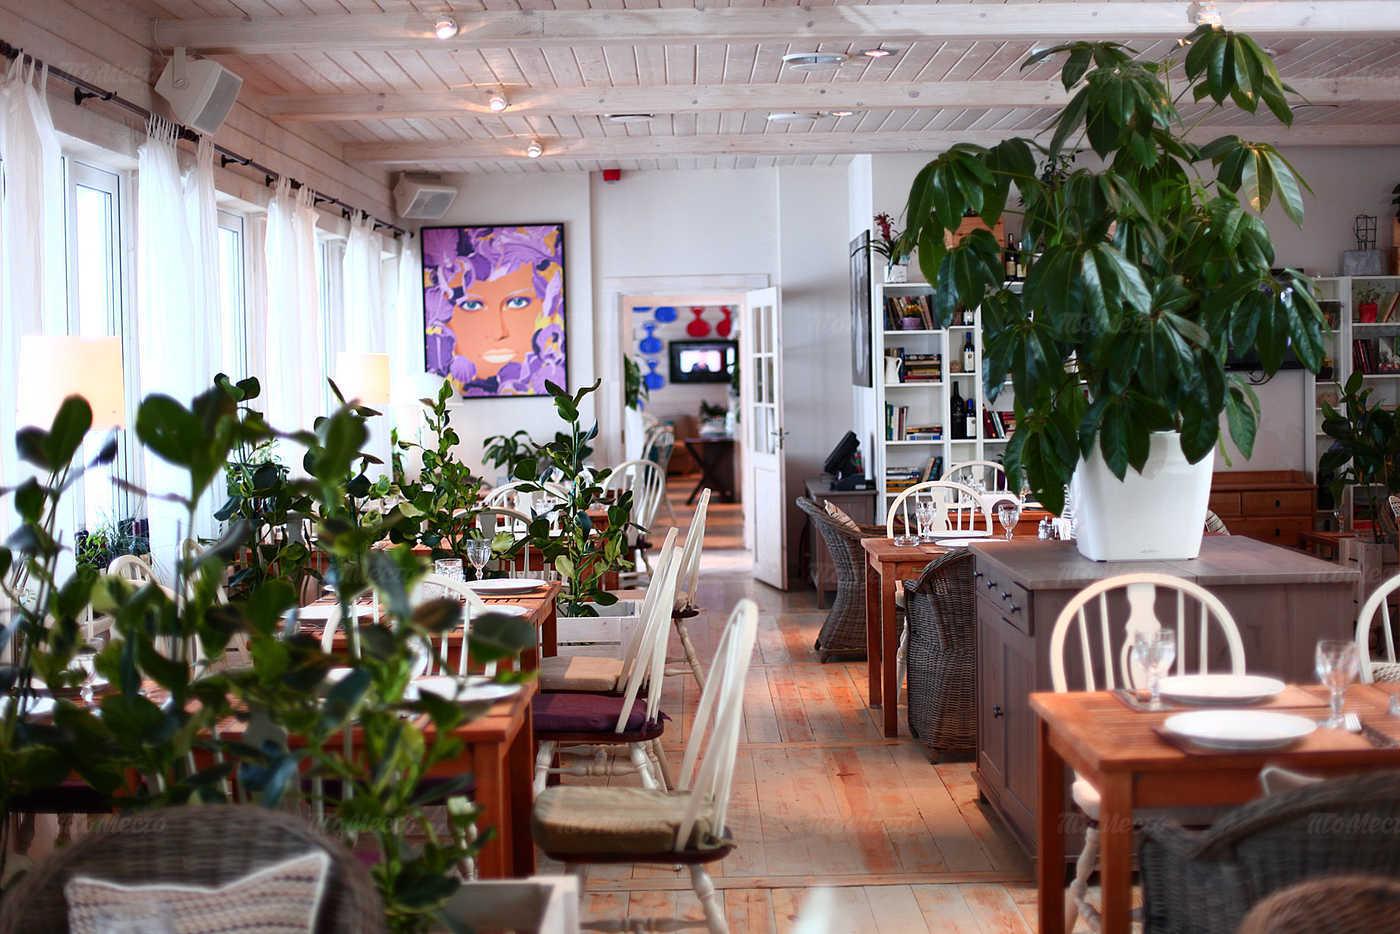 restoran-prichal-na-2-m-km-ilinskogo-shosse_4b46f_full-56824